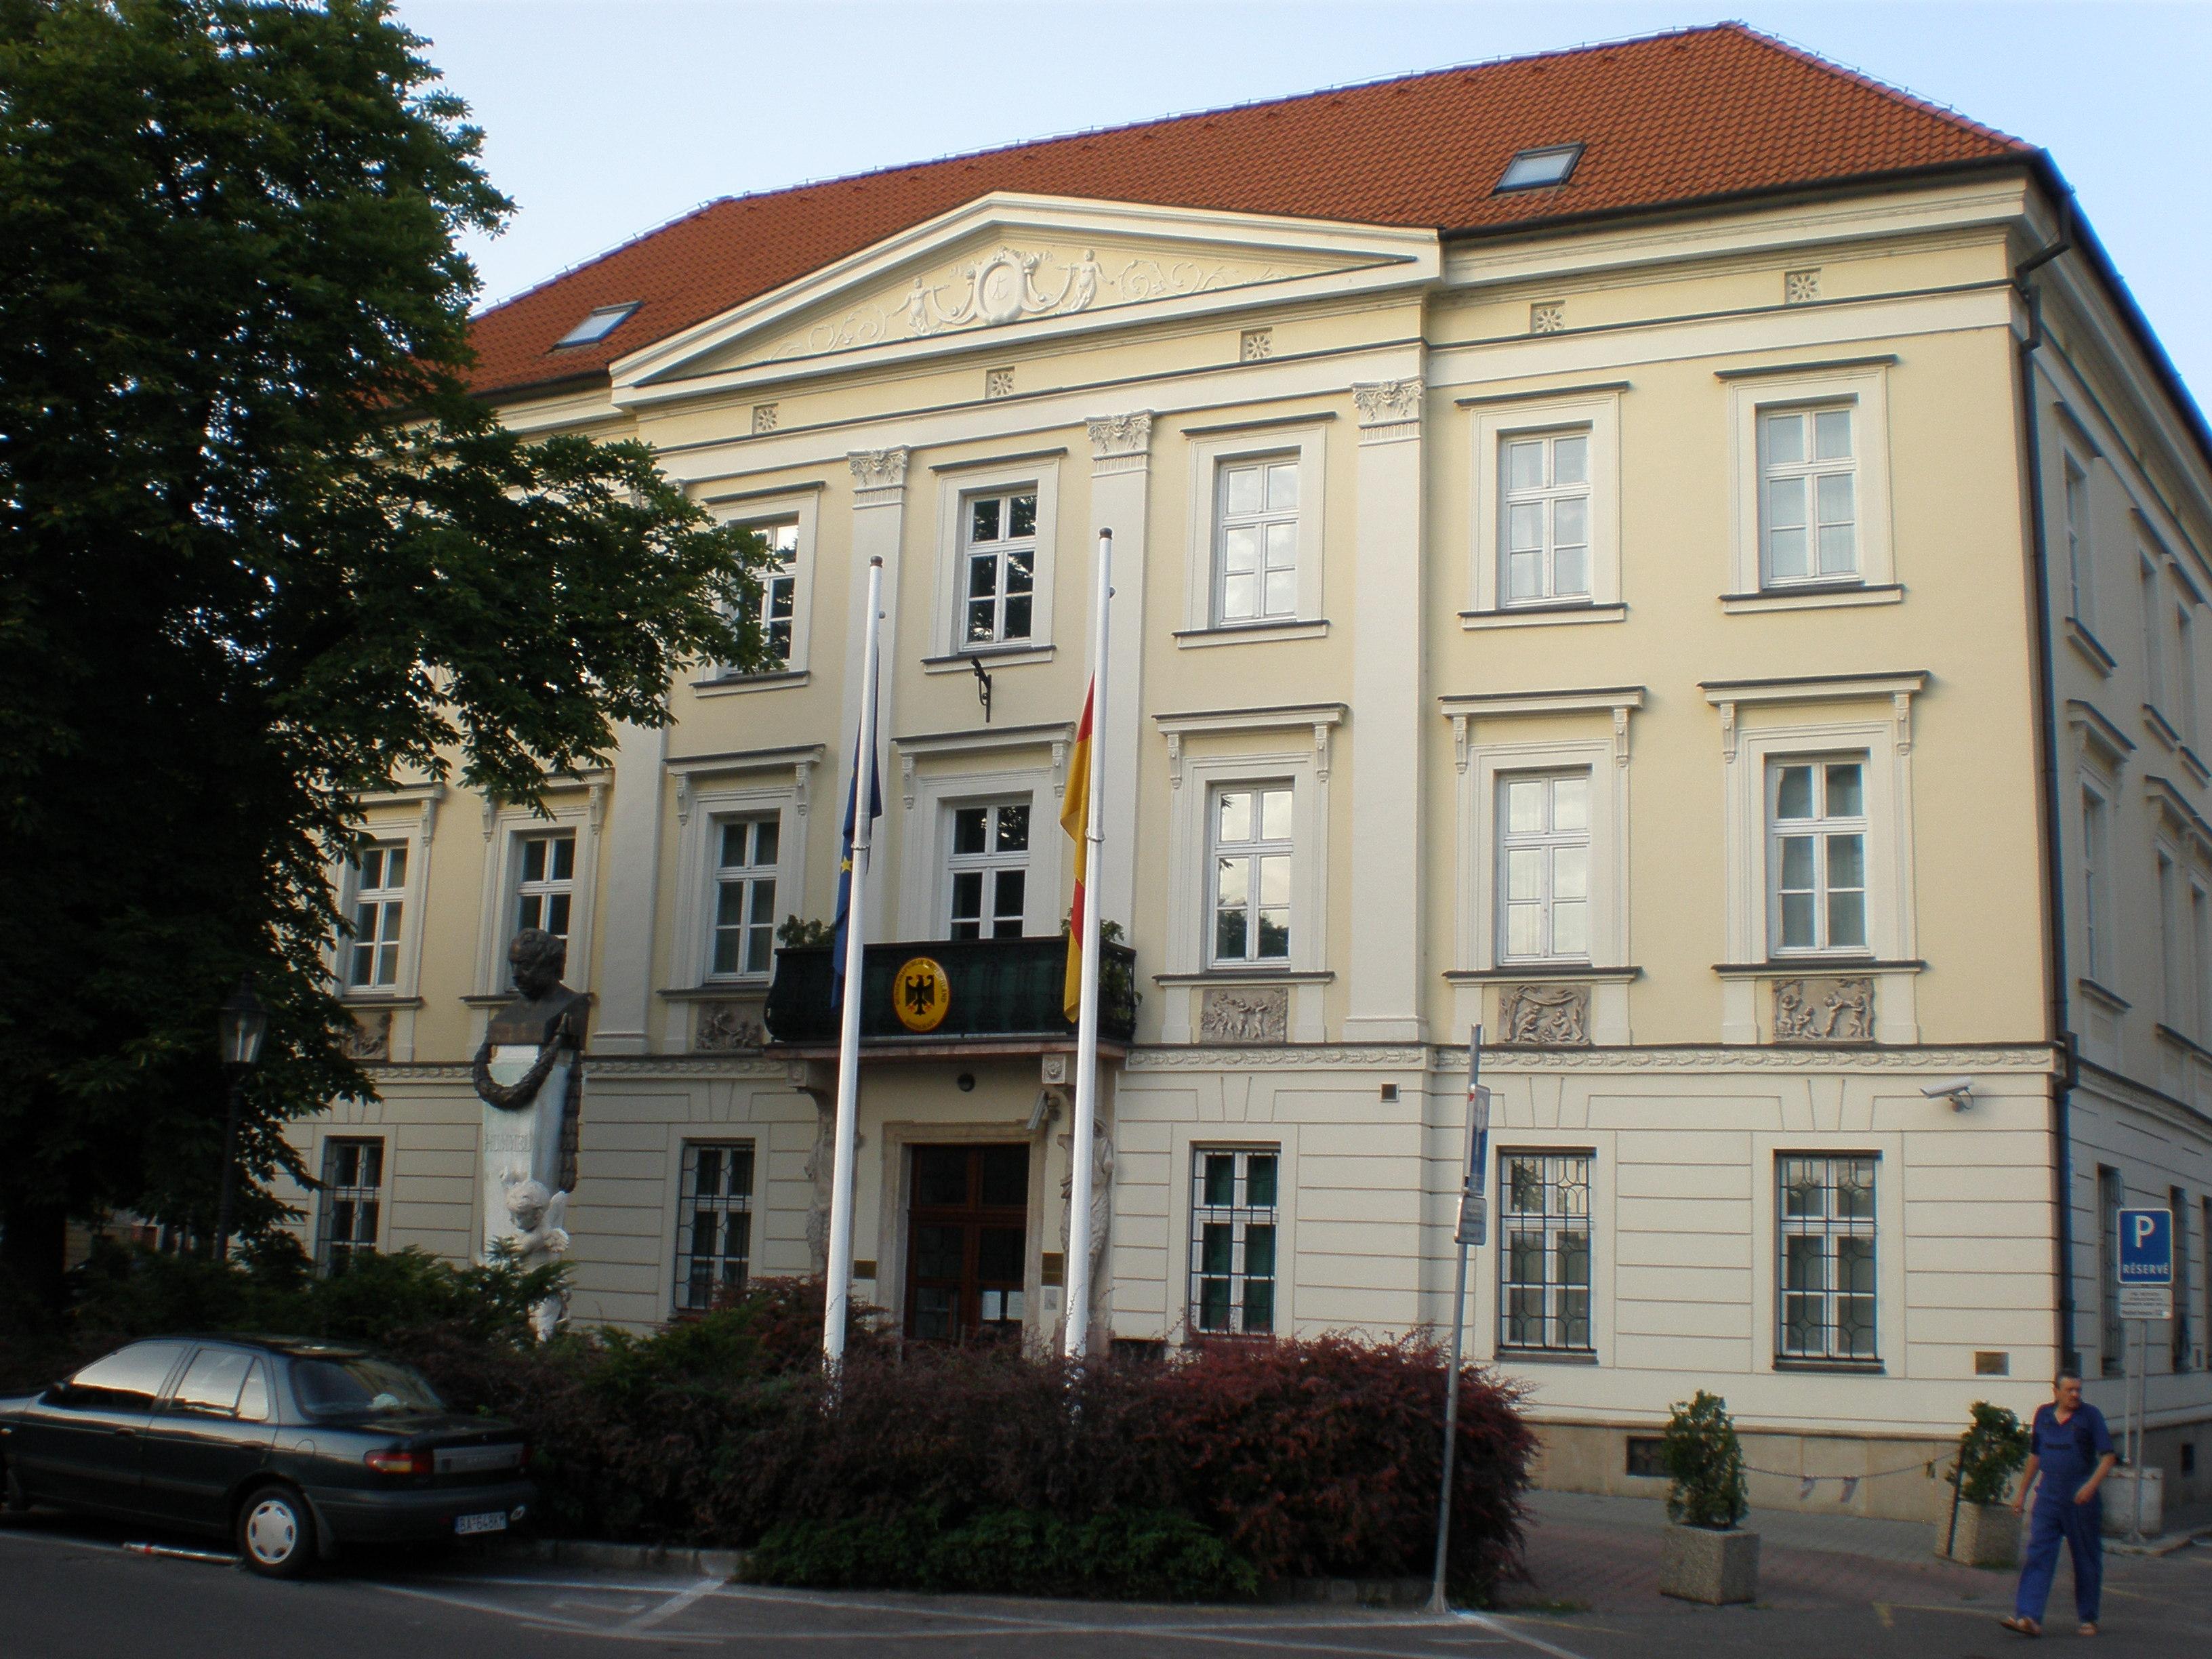 file german embassy bratislava 6250534 jpg wikimedia commons. Black Bedroom Furniture Sets. Home Design Ideas